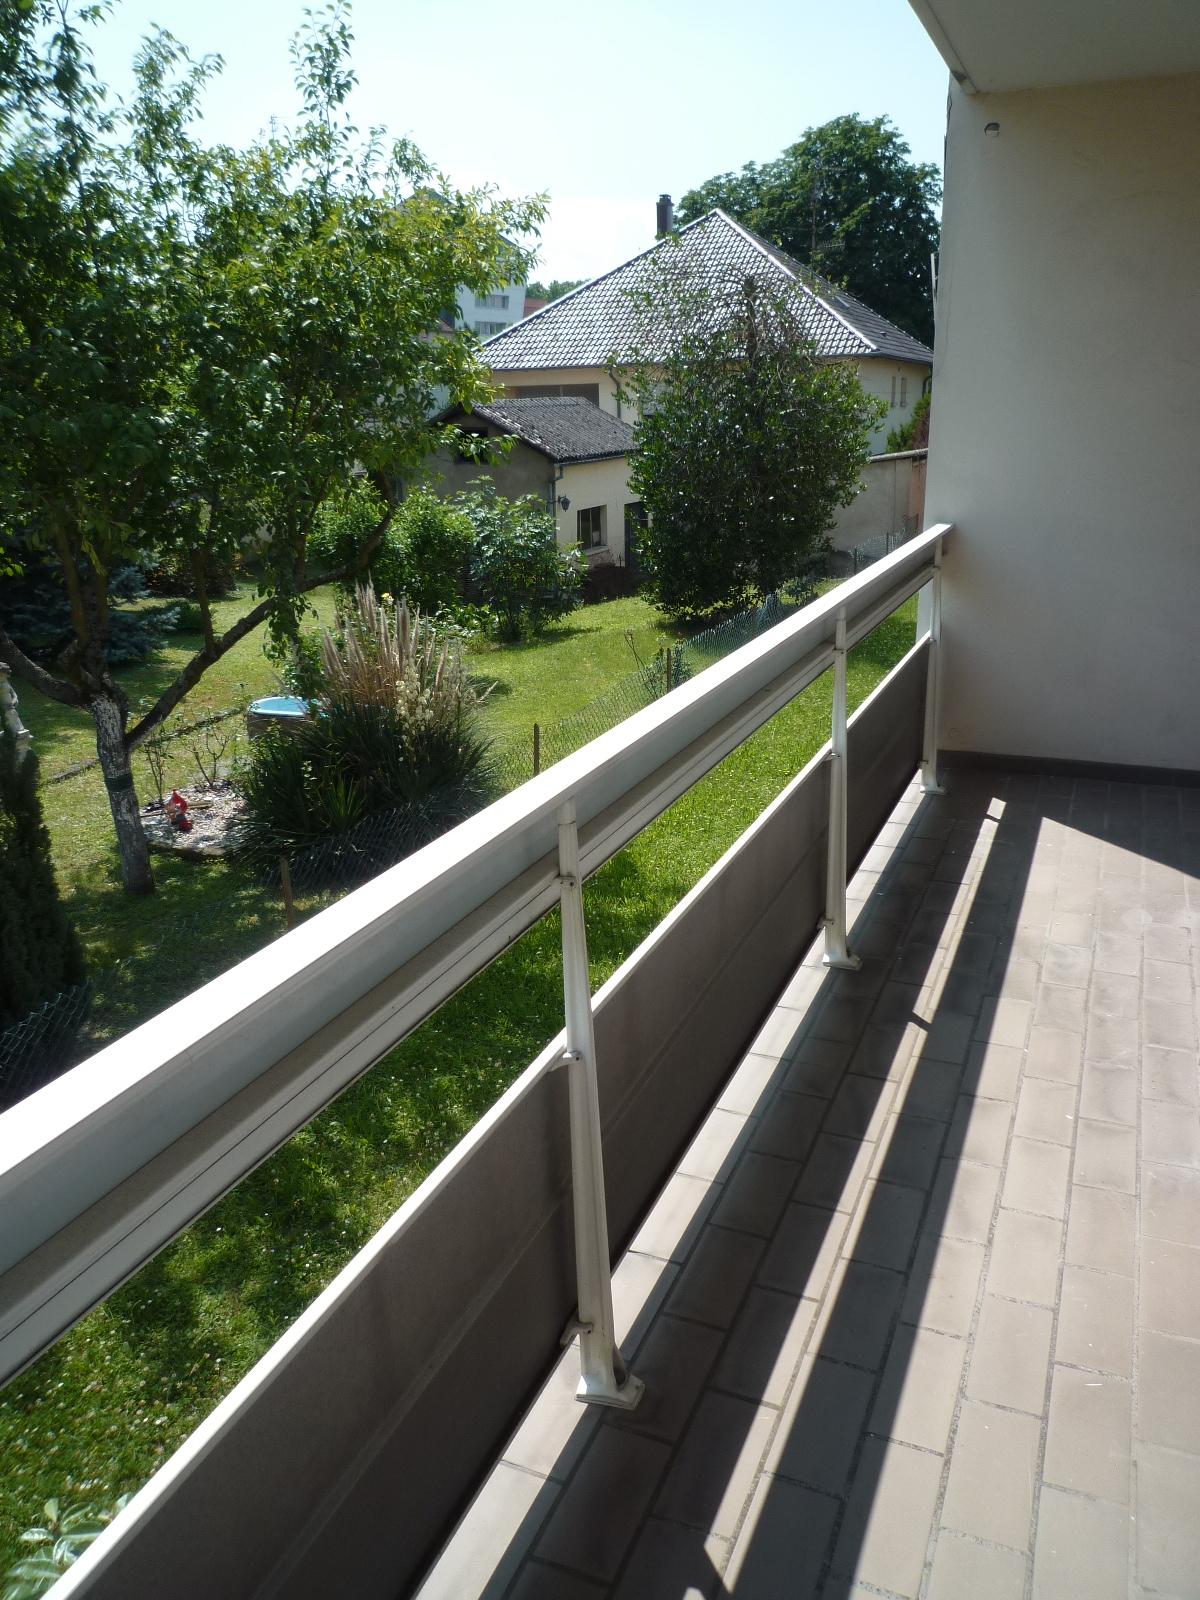 [Soleil] Beau 3 pièces avec terrasse et garage - Illkirch - nos locations - Beausite Immobilier 4